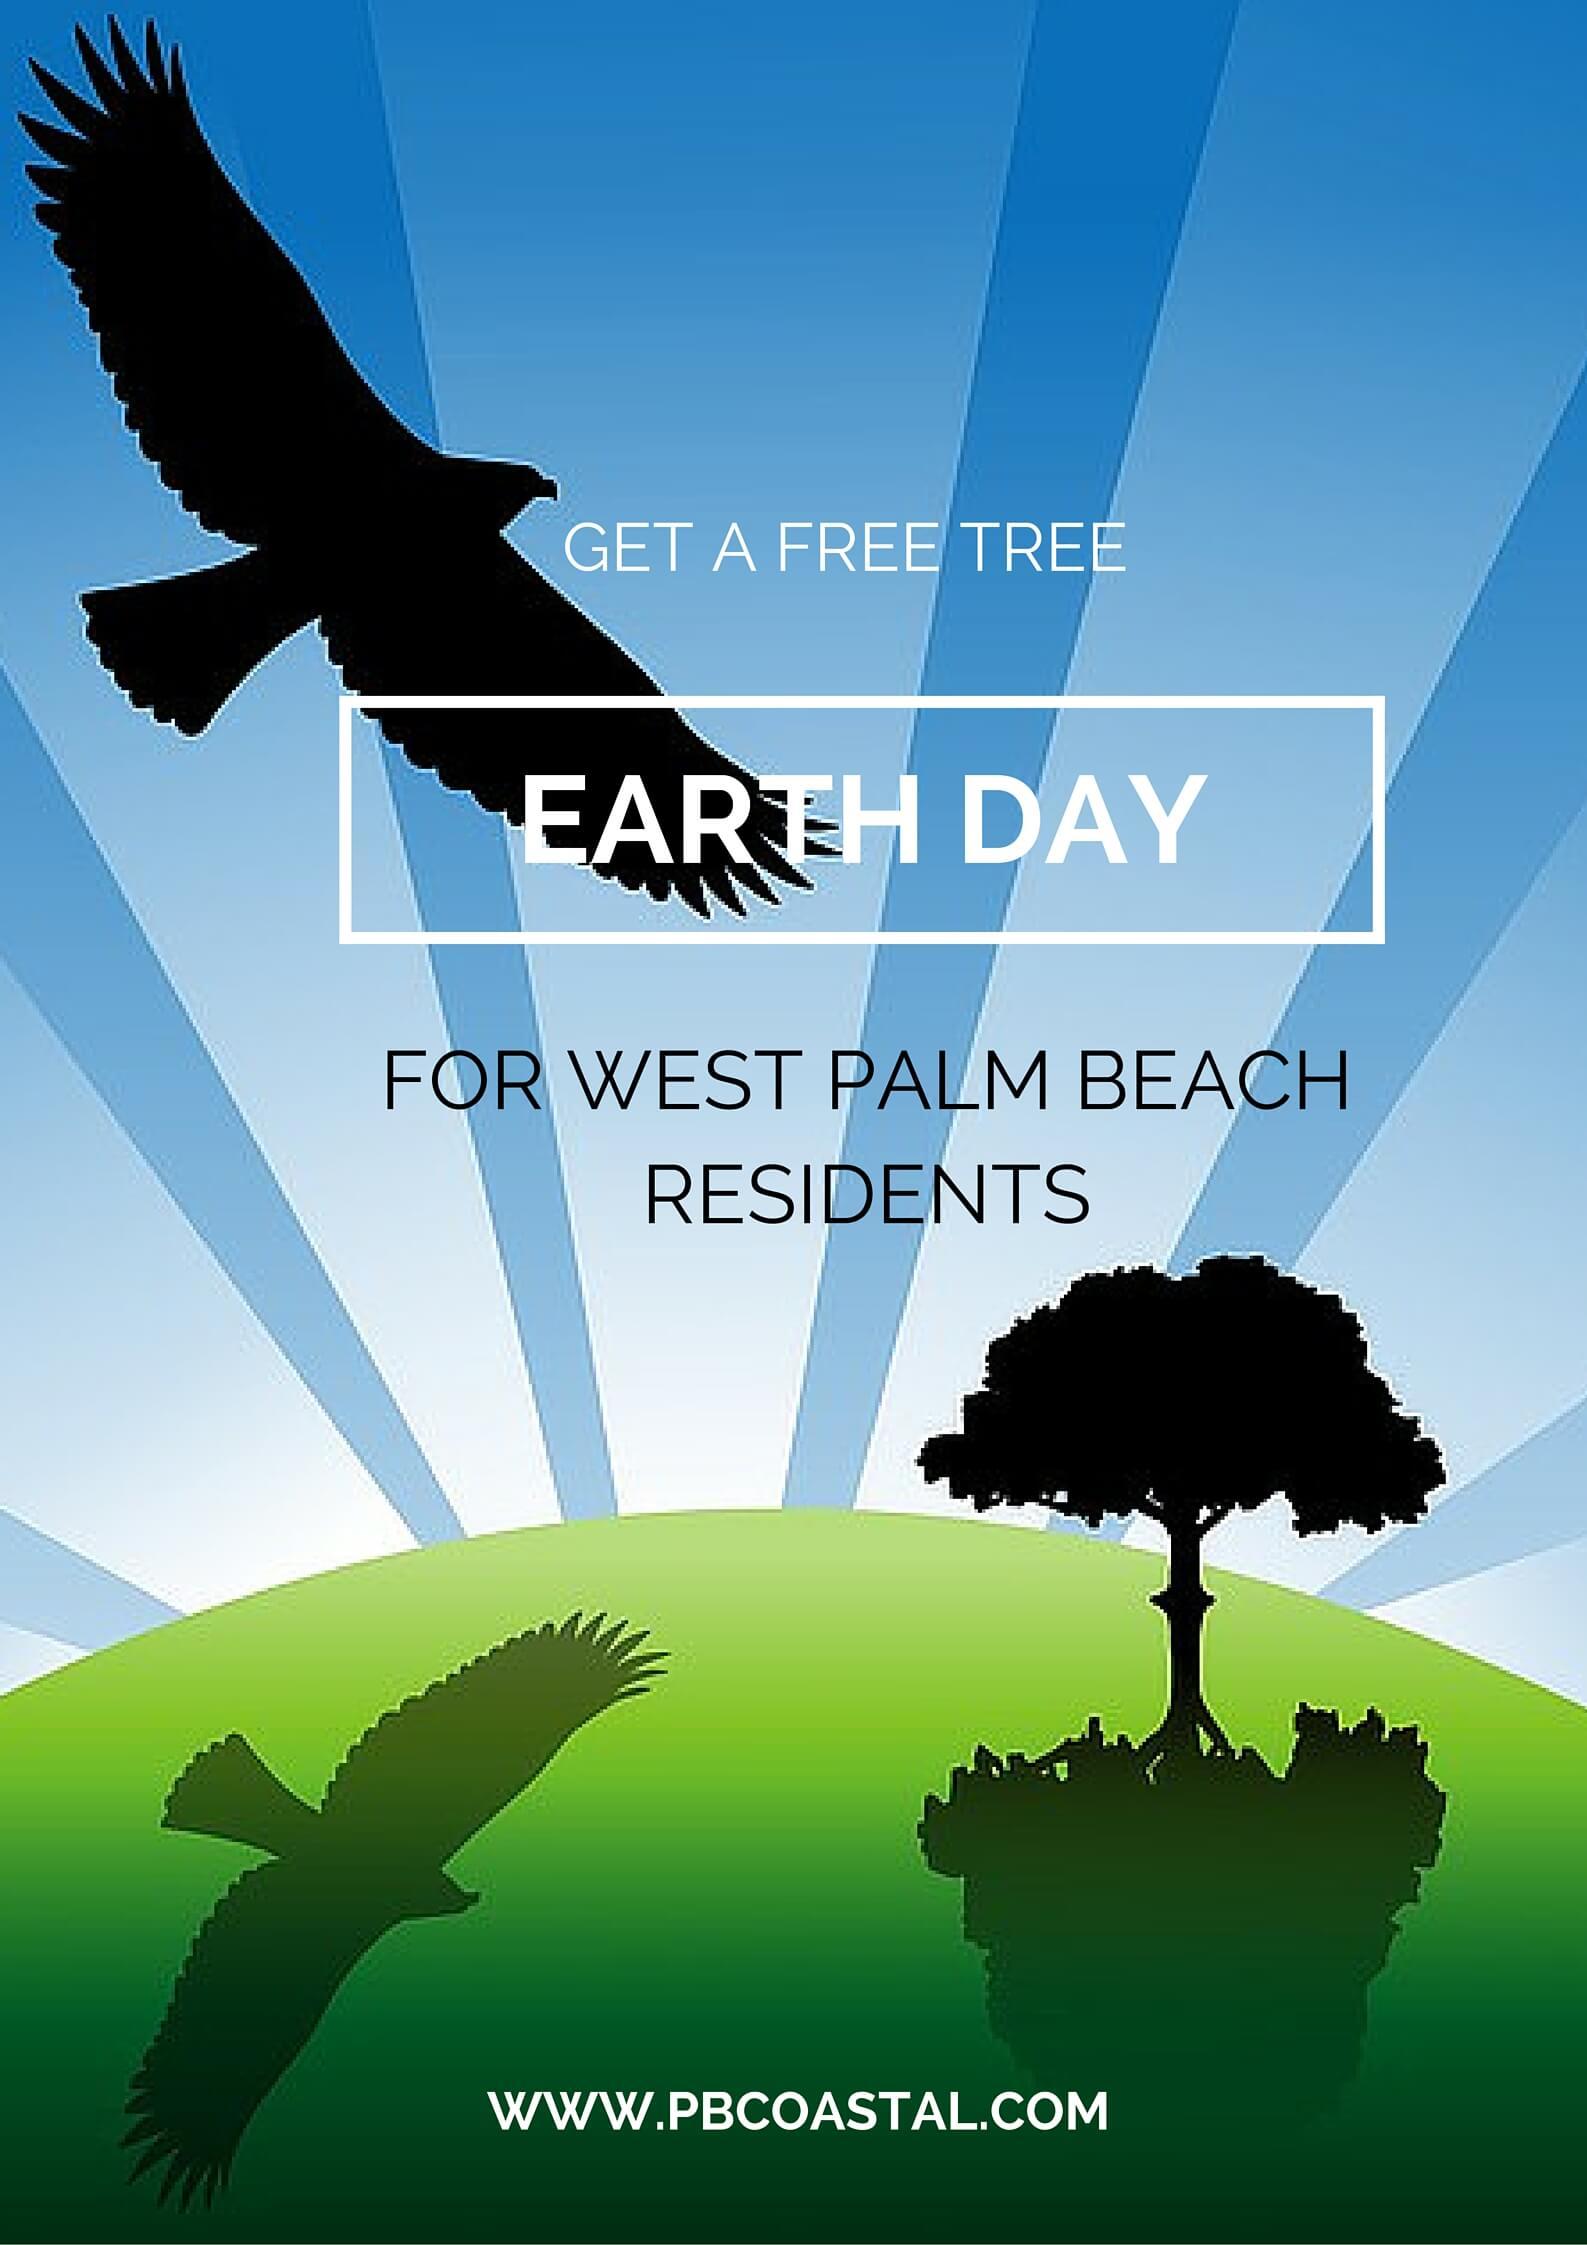 get a free tree